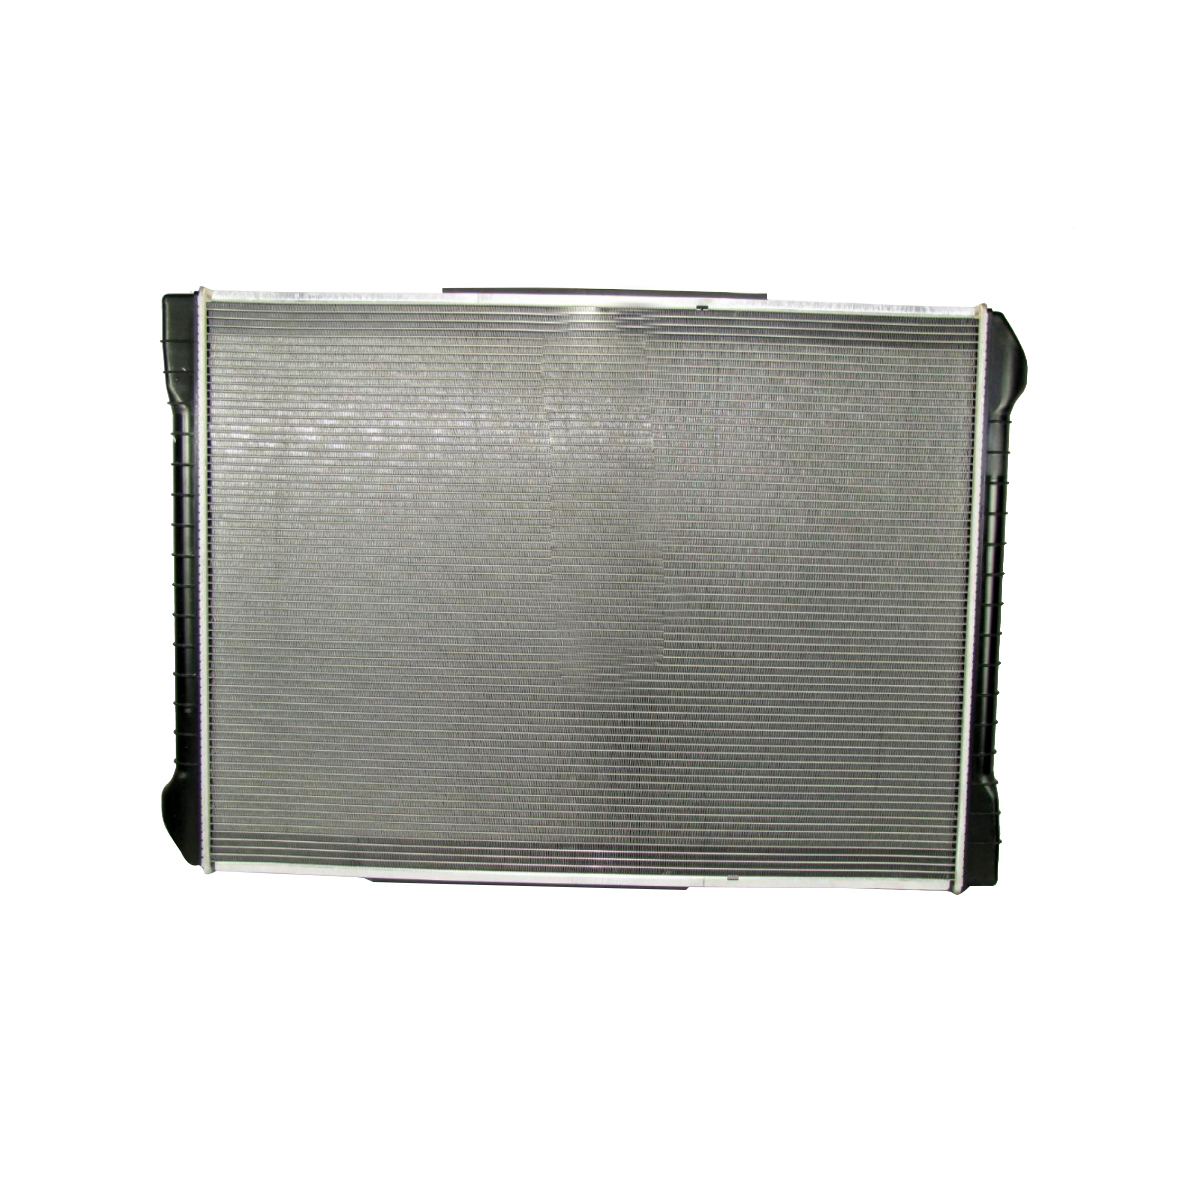 ford l ln ltl cl series 88 90 radiator oem e8ht8009g 2